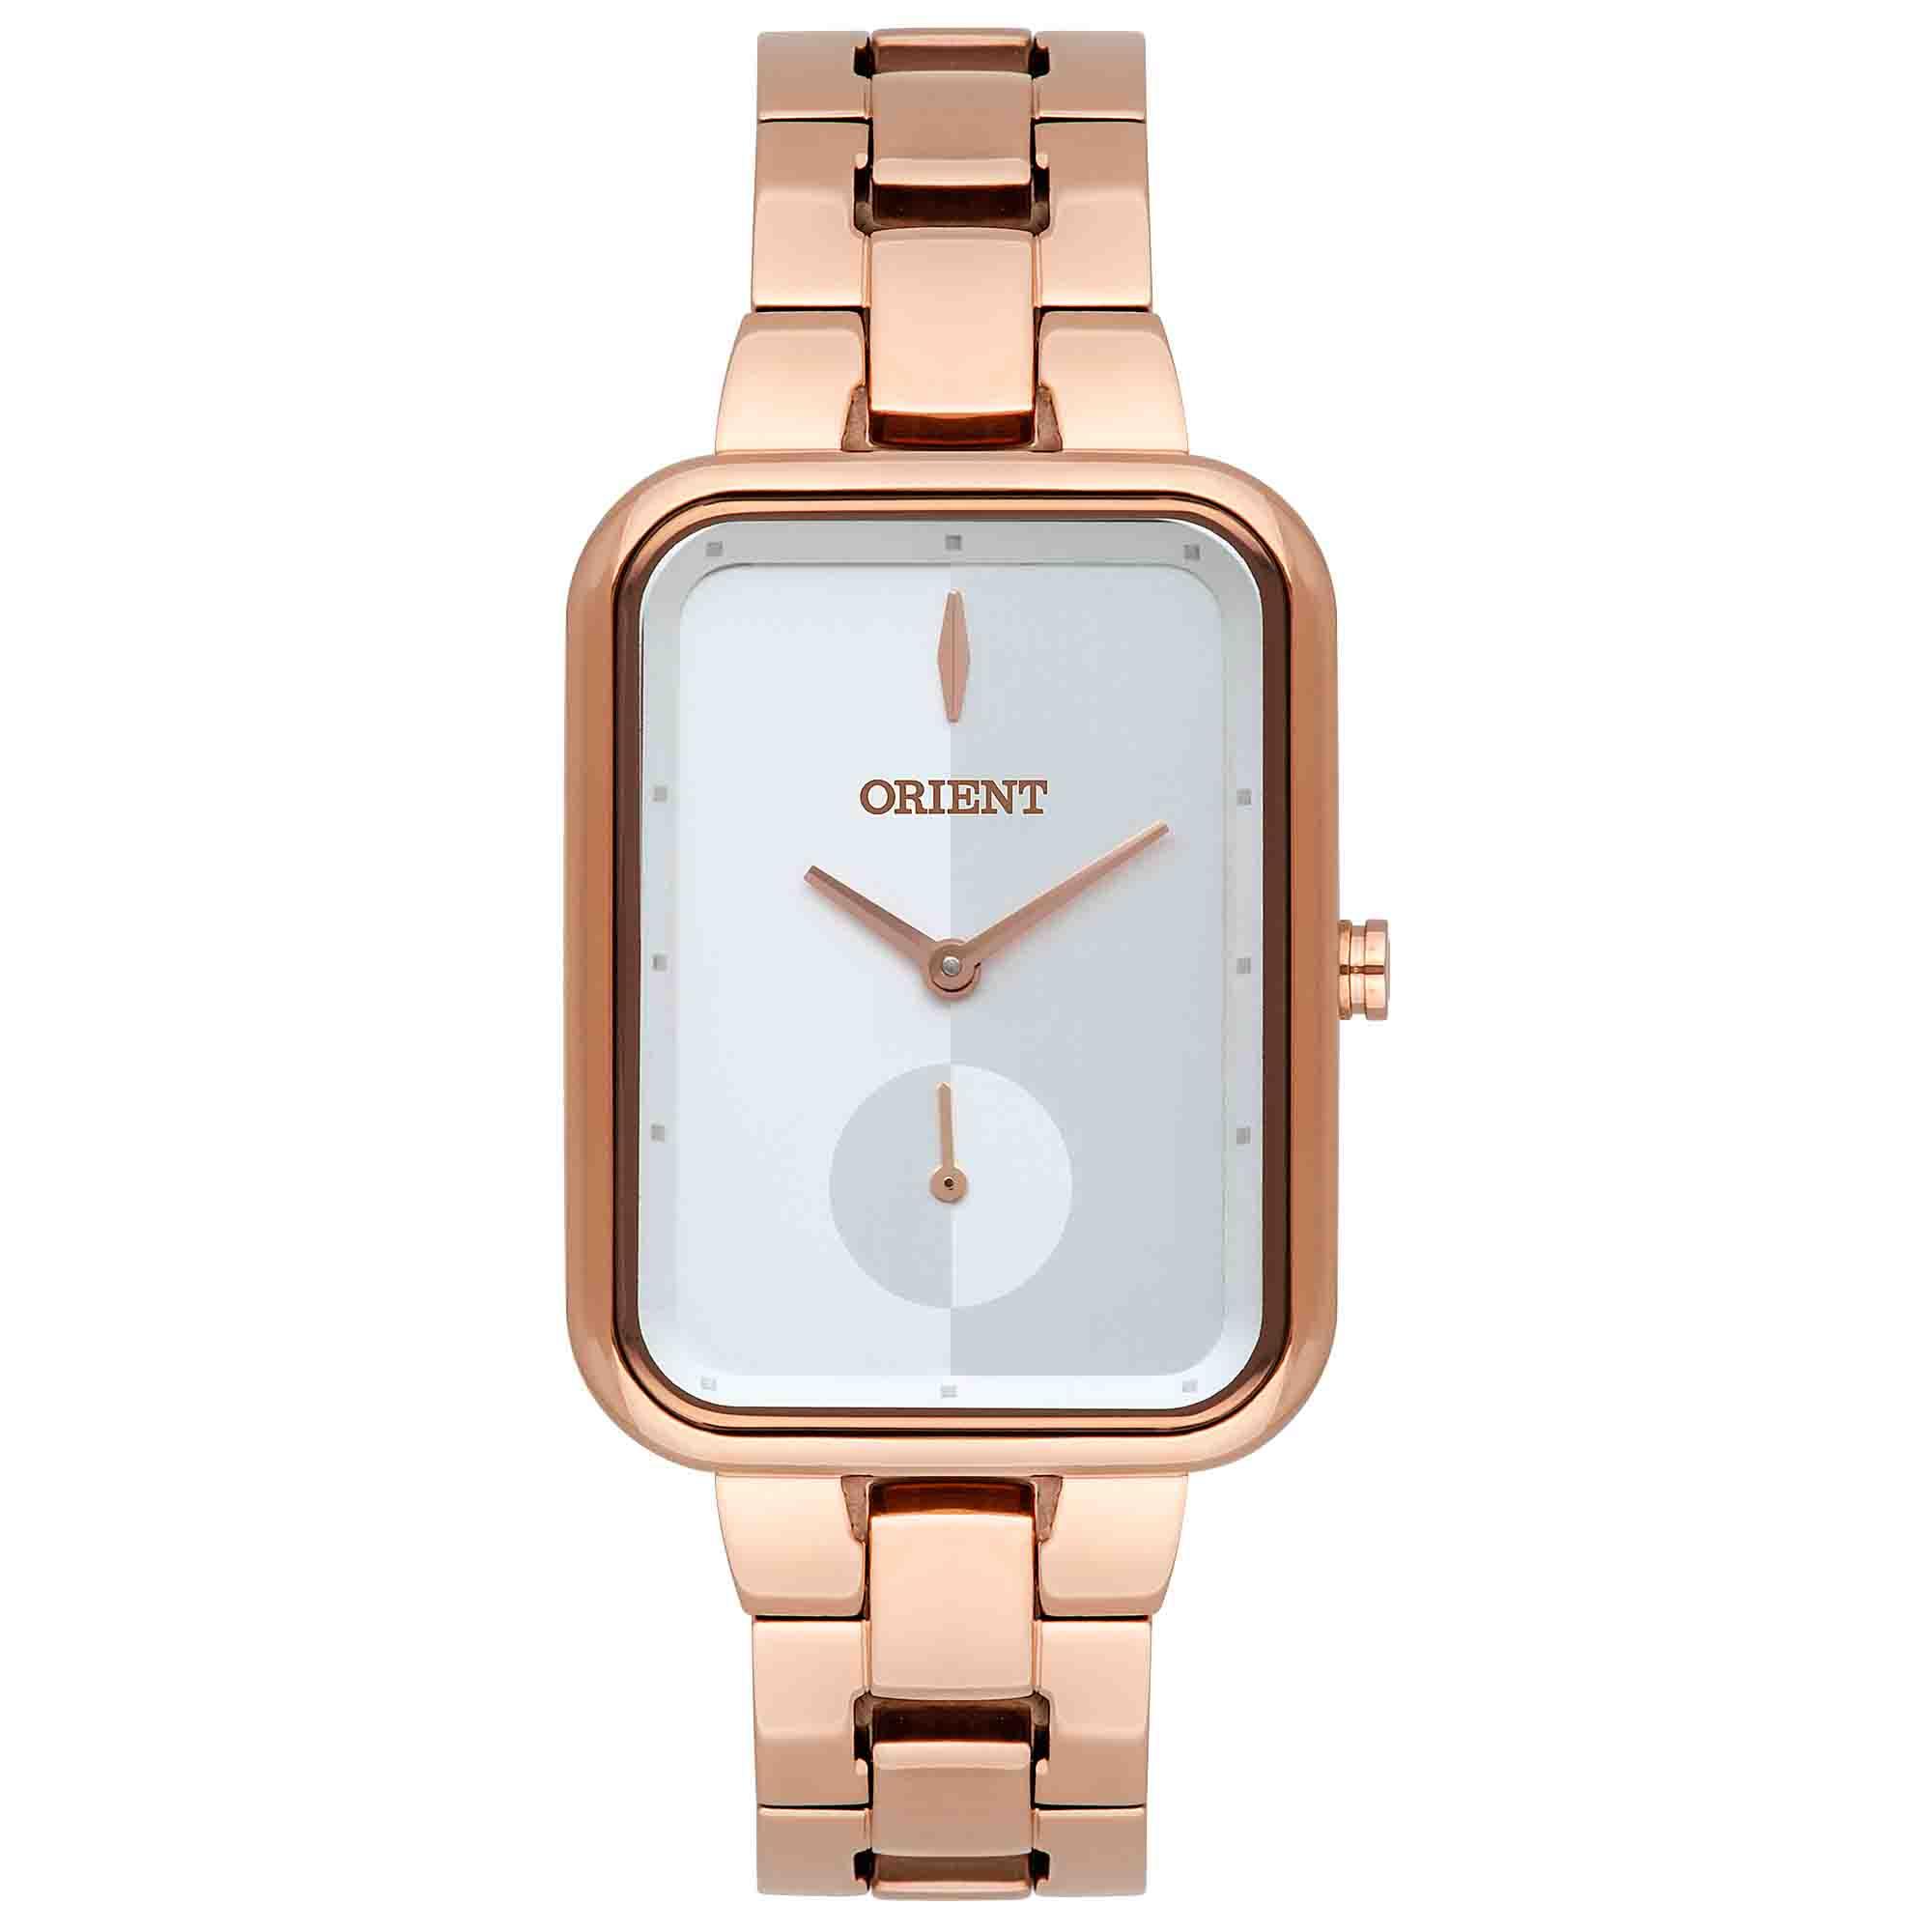 Relógio Feminino Orient LRSS0006 S1RX